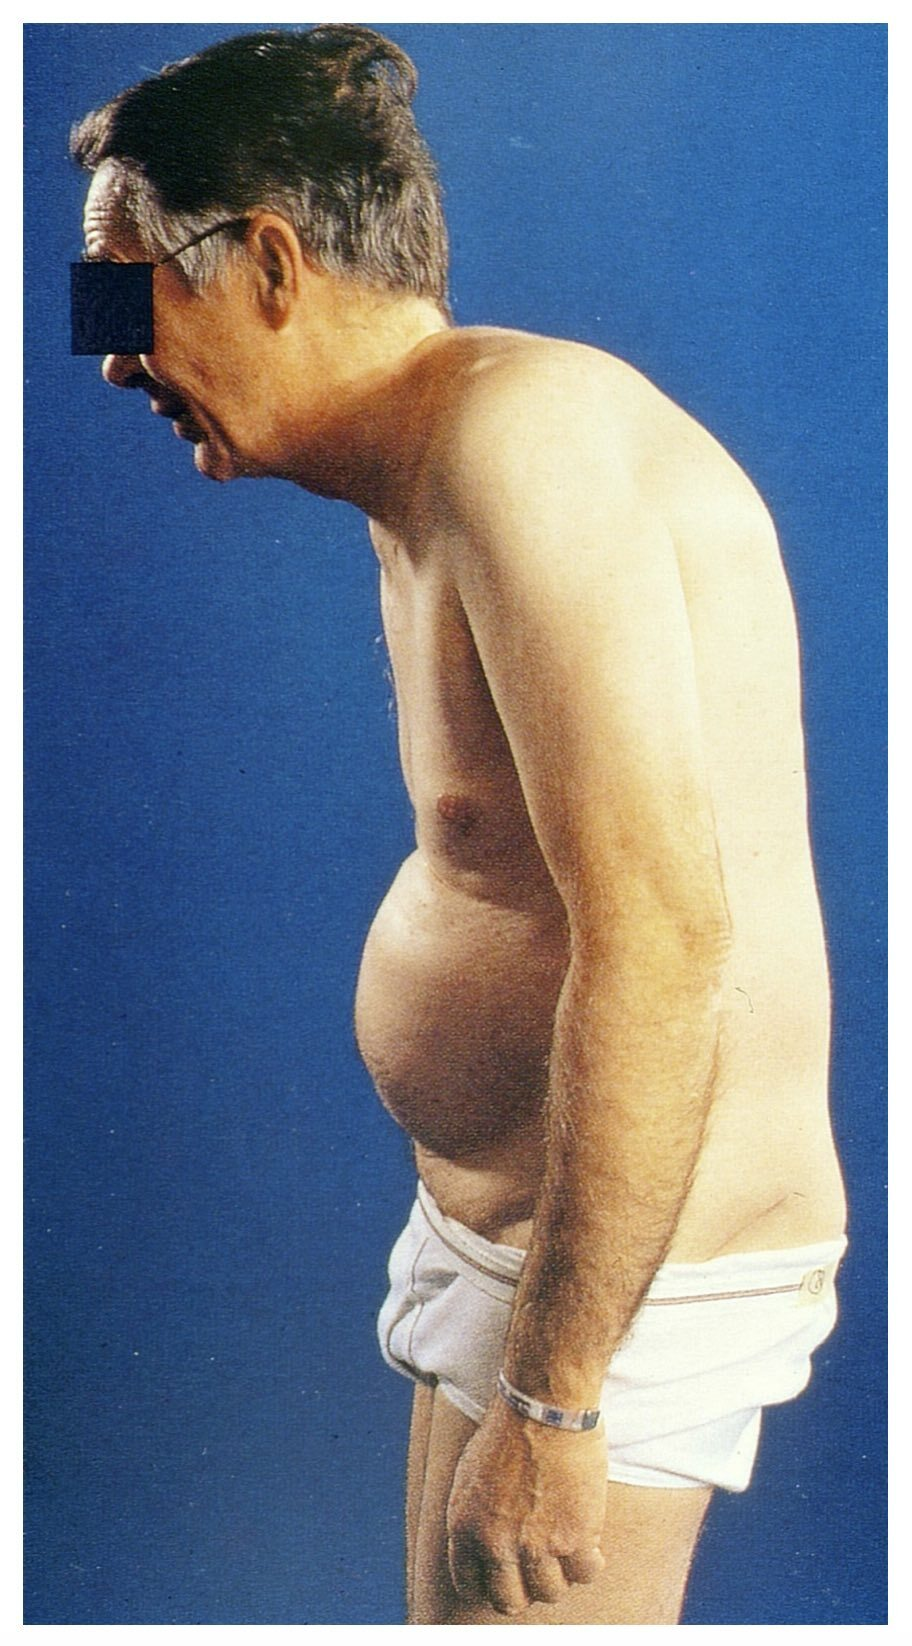 Question mark posture